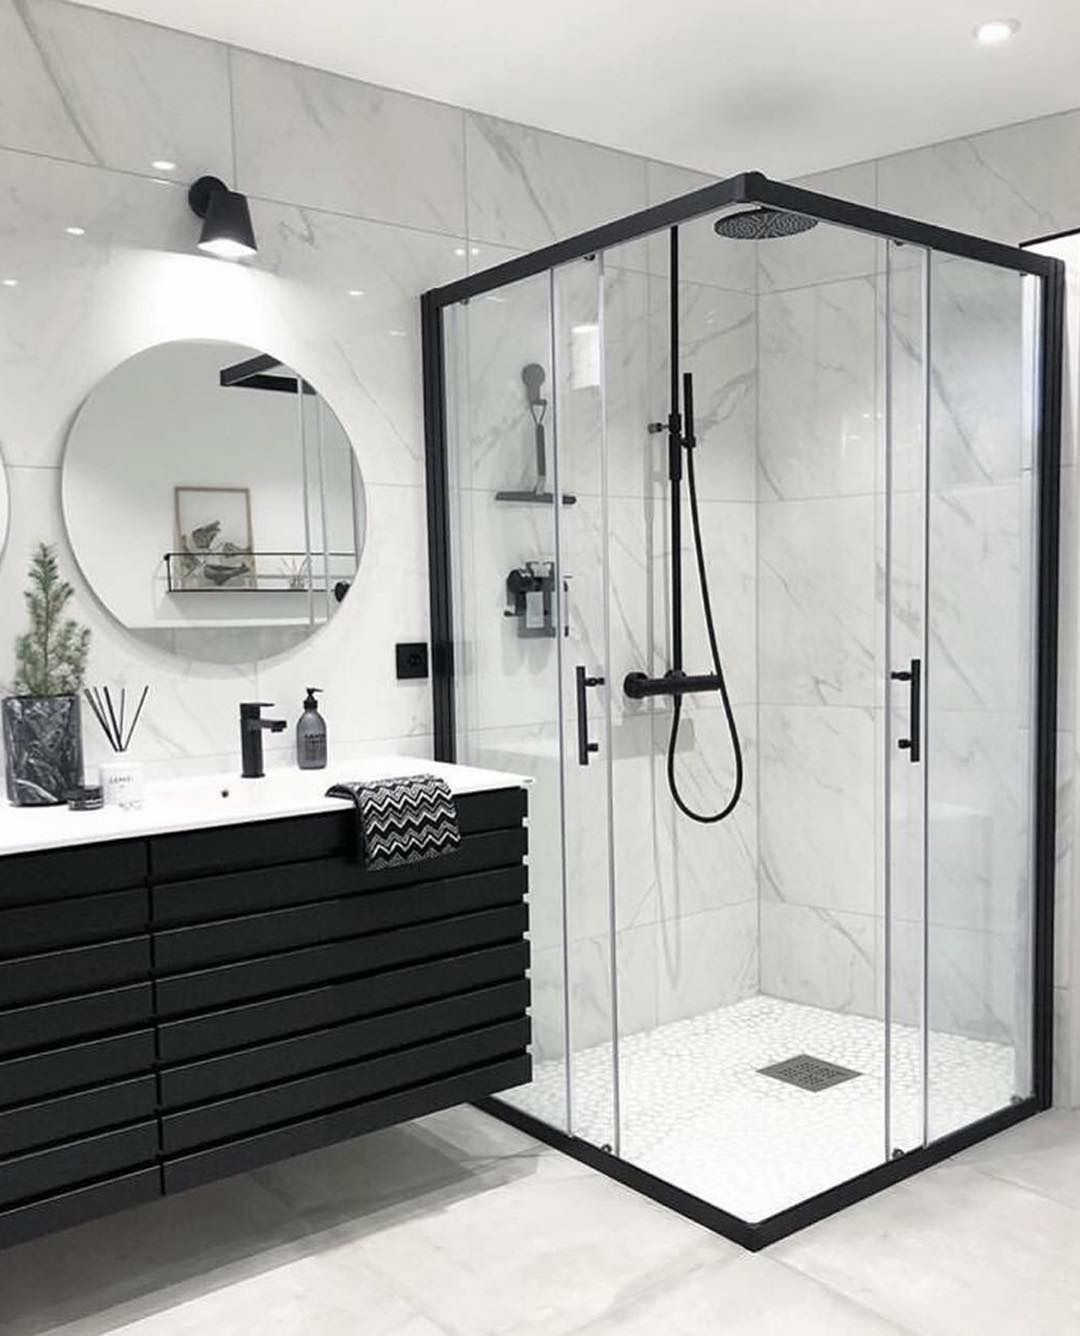 5 Gorgeous Scandinavian Bathroom Ideas: Top 5 Bathroom Inspiration This WeekThe Perfect